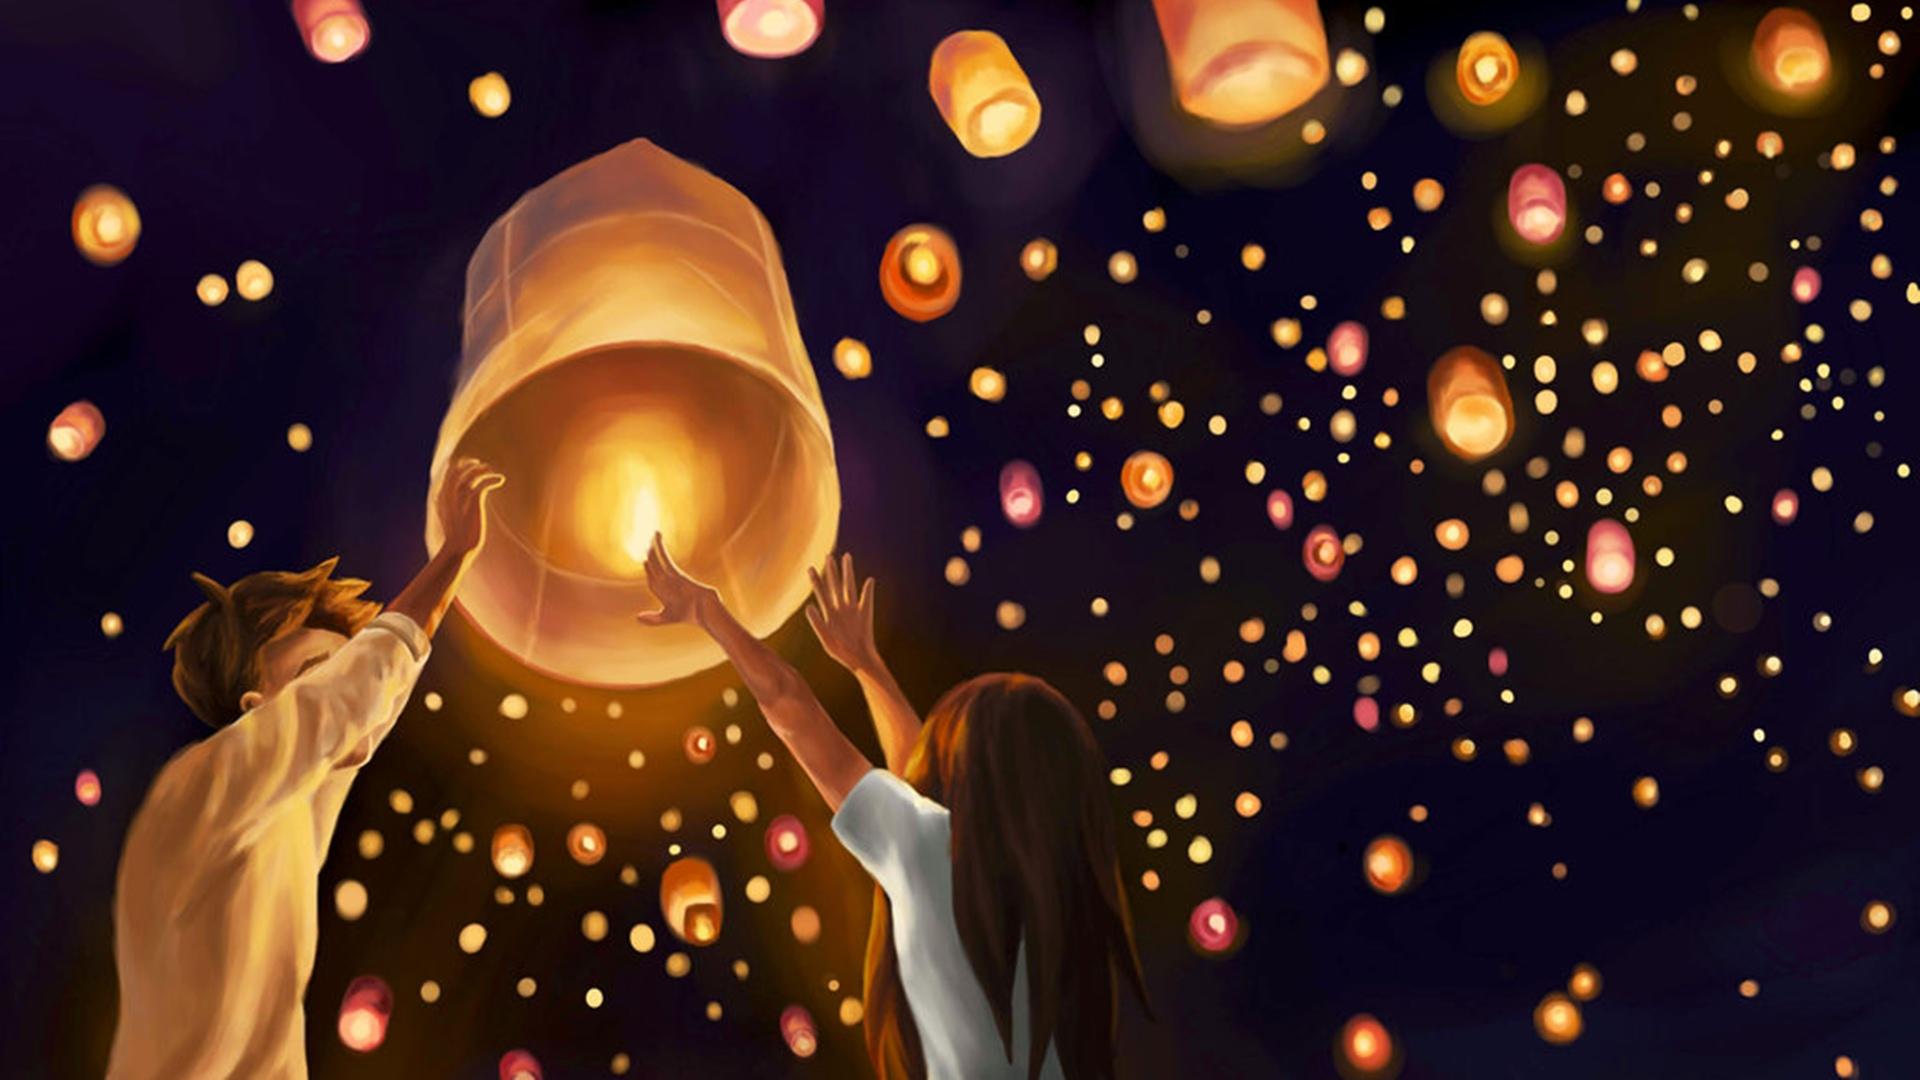 Paper Sky Lantern HQ Background Wallpaper 25509 Baltana